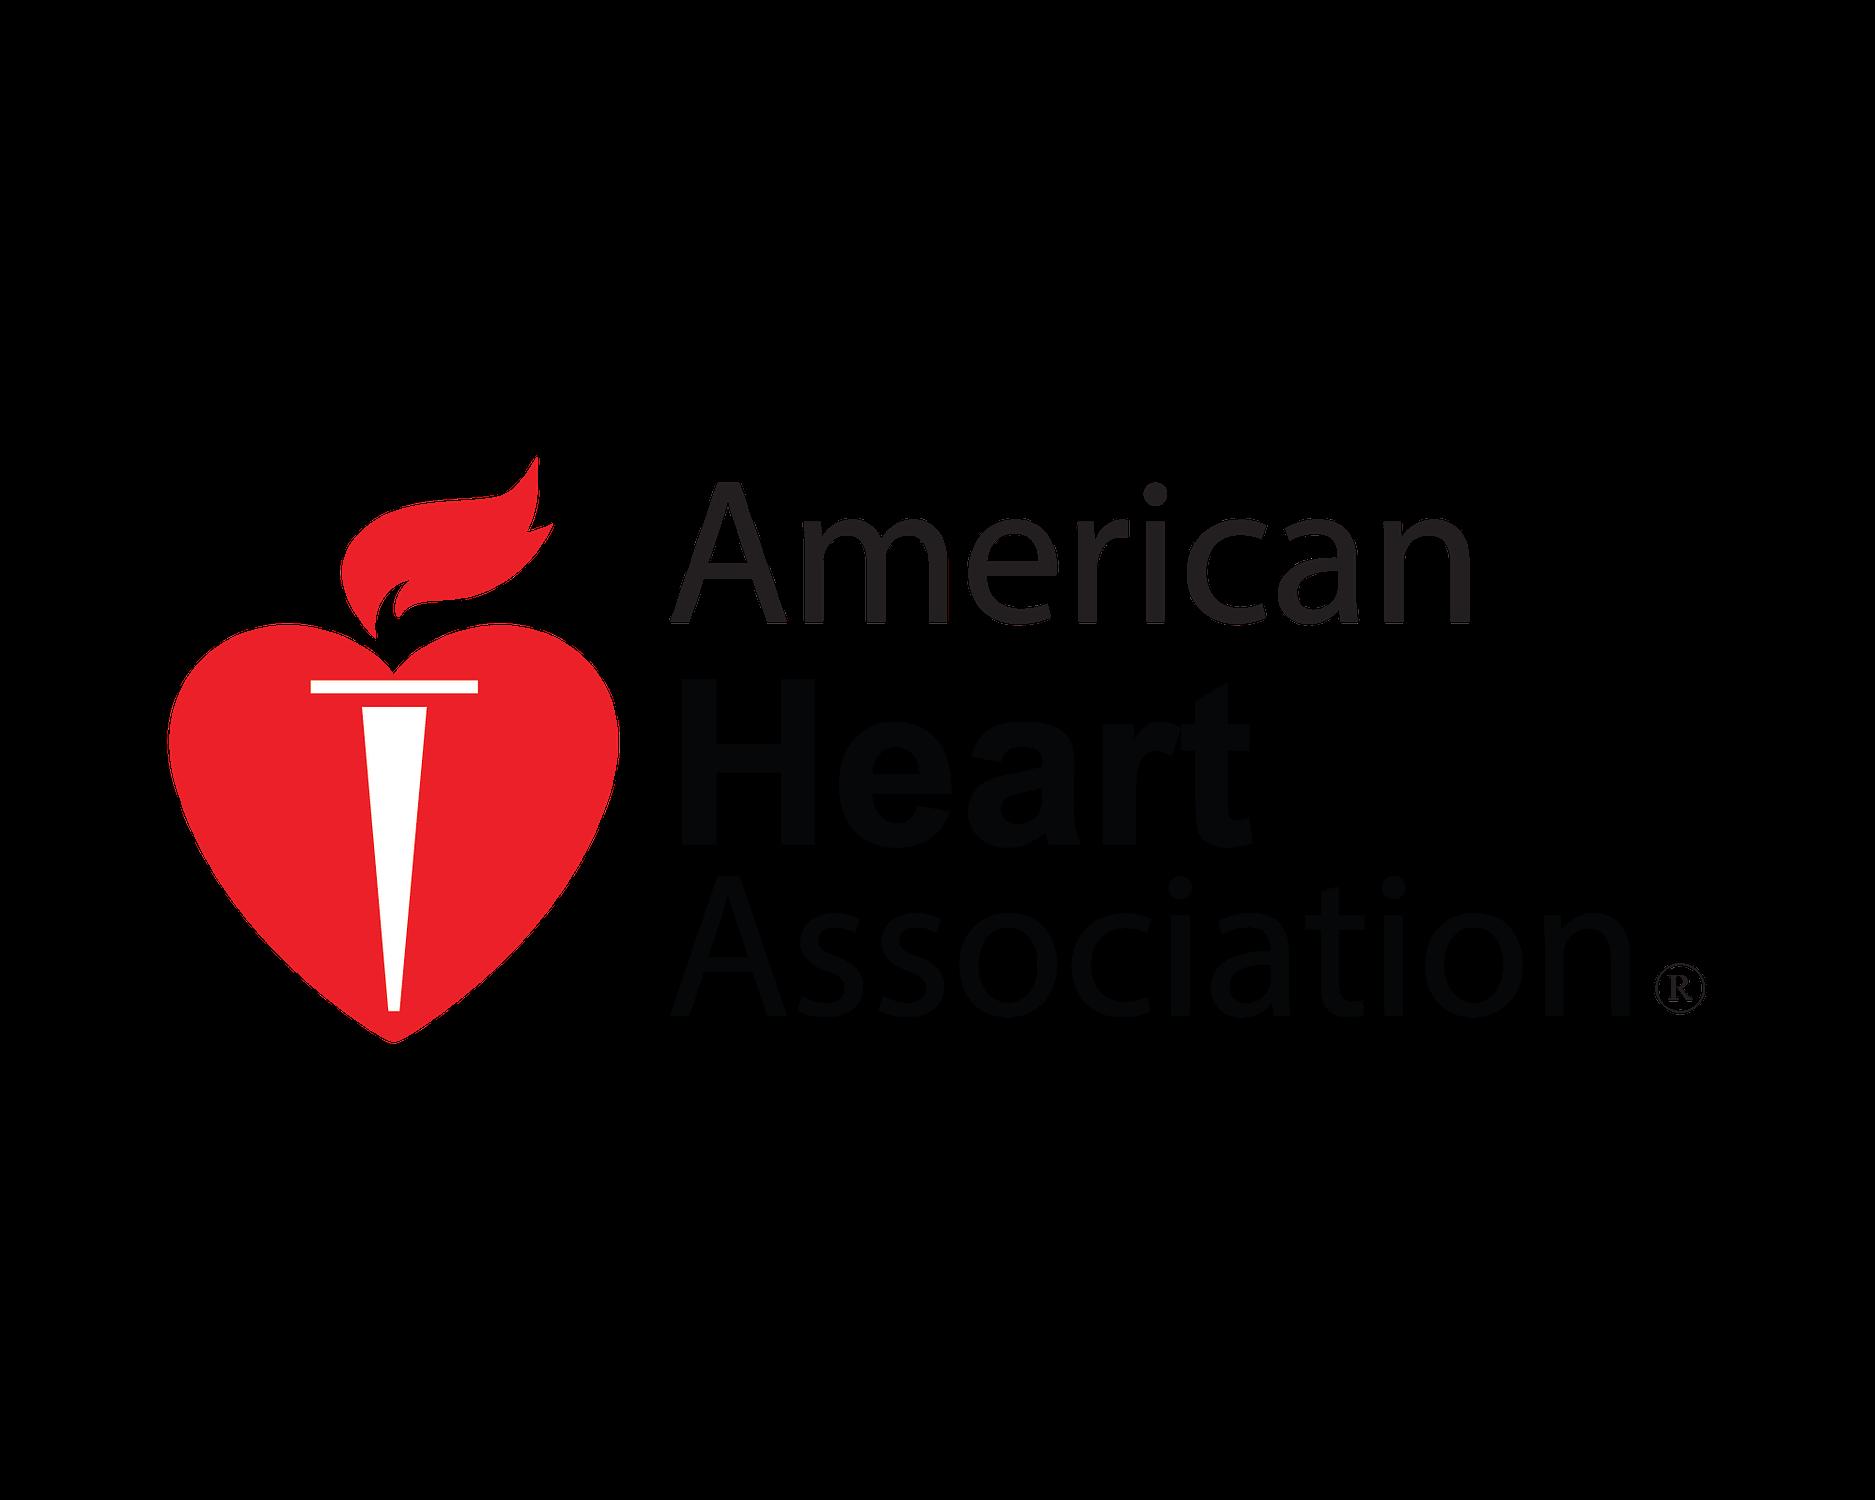 American Heart Association Statement on Fulminant Myocarditis